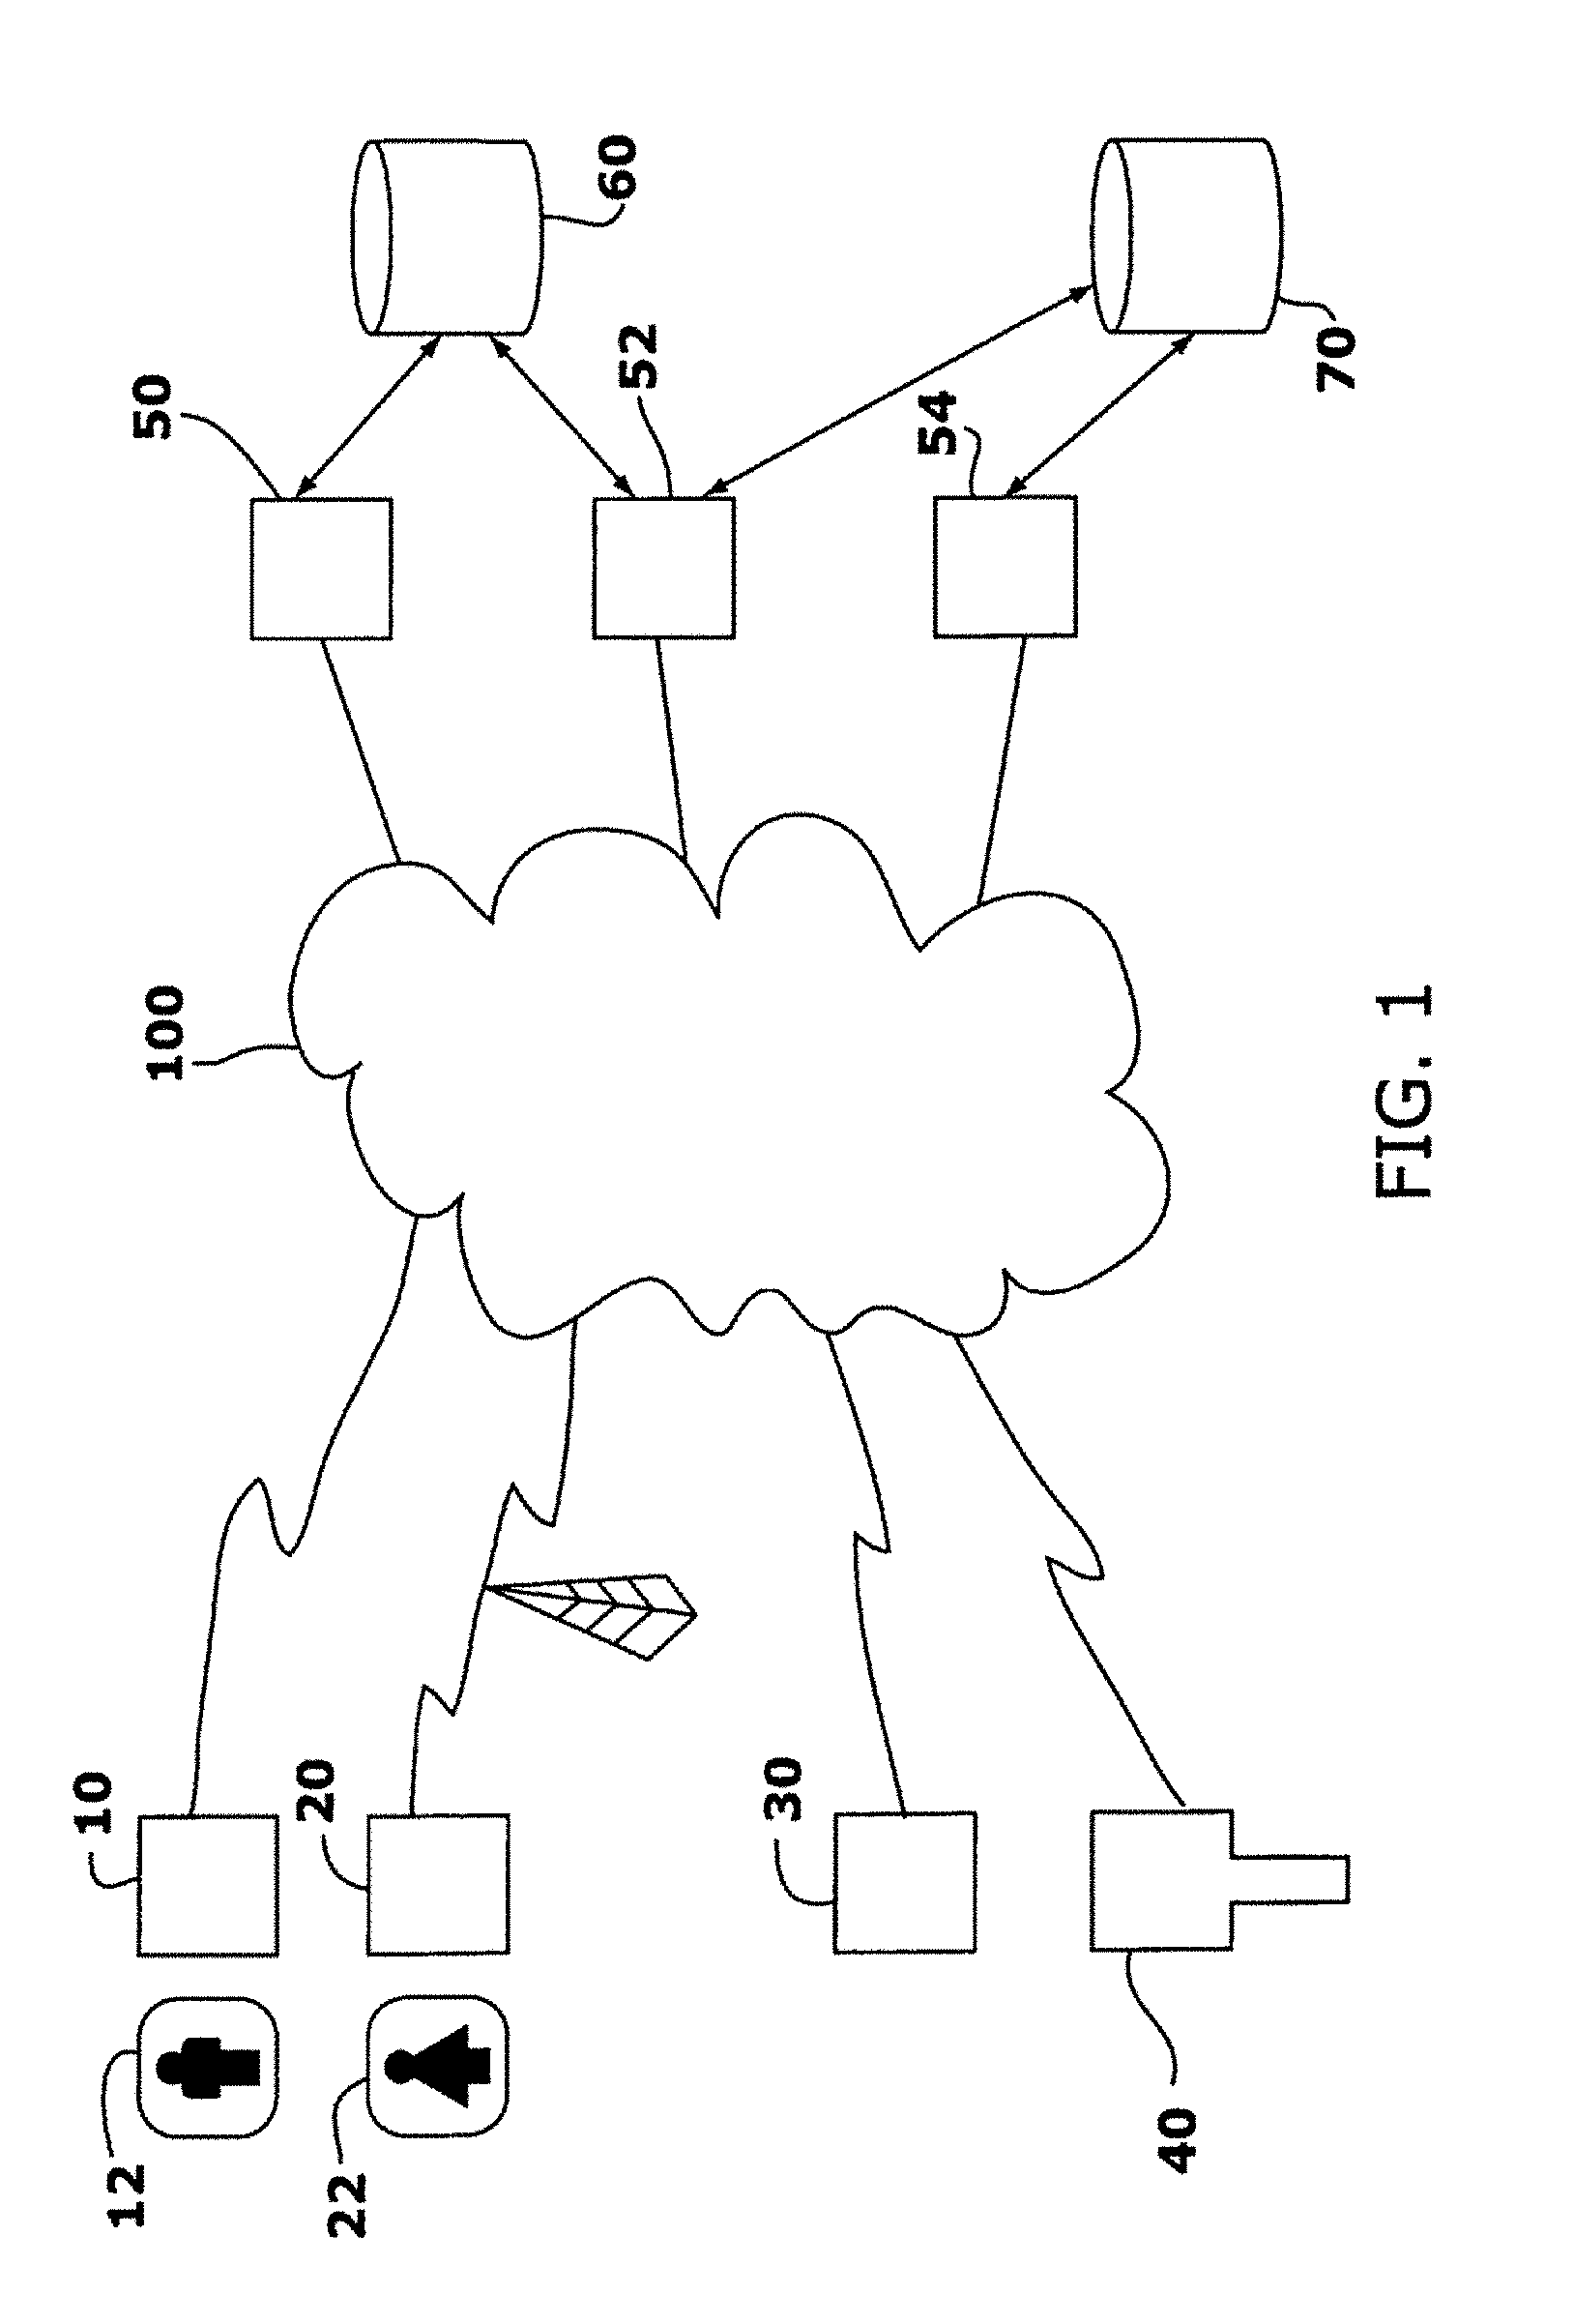 Patent US 9,799,041 B2